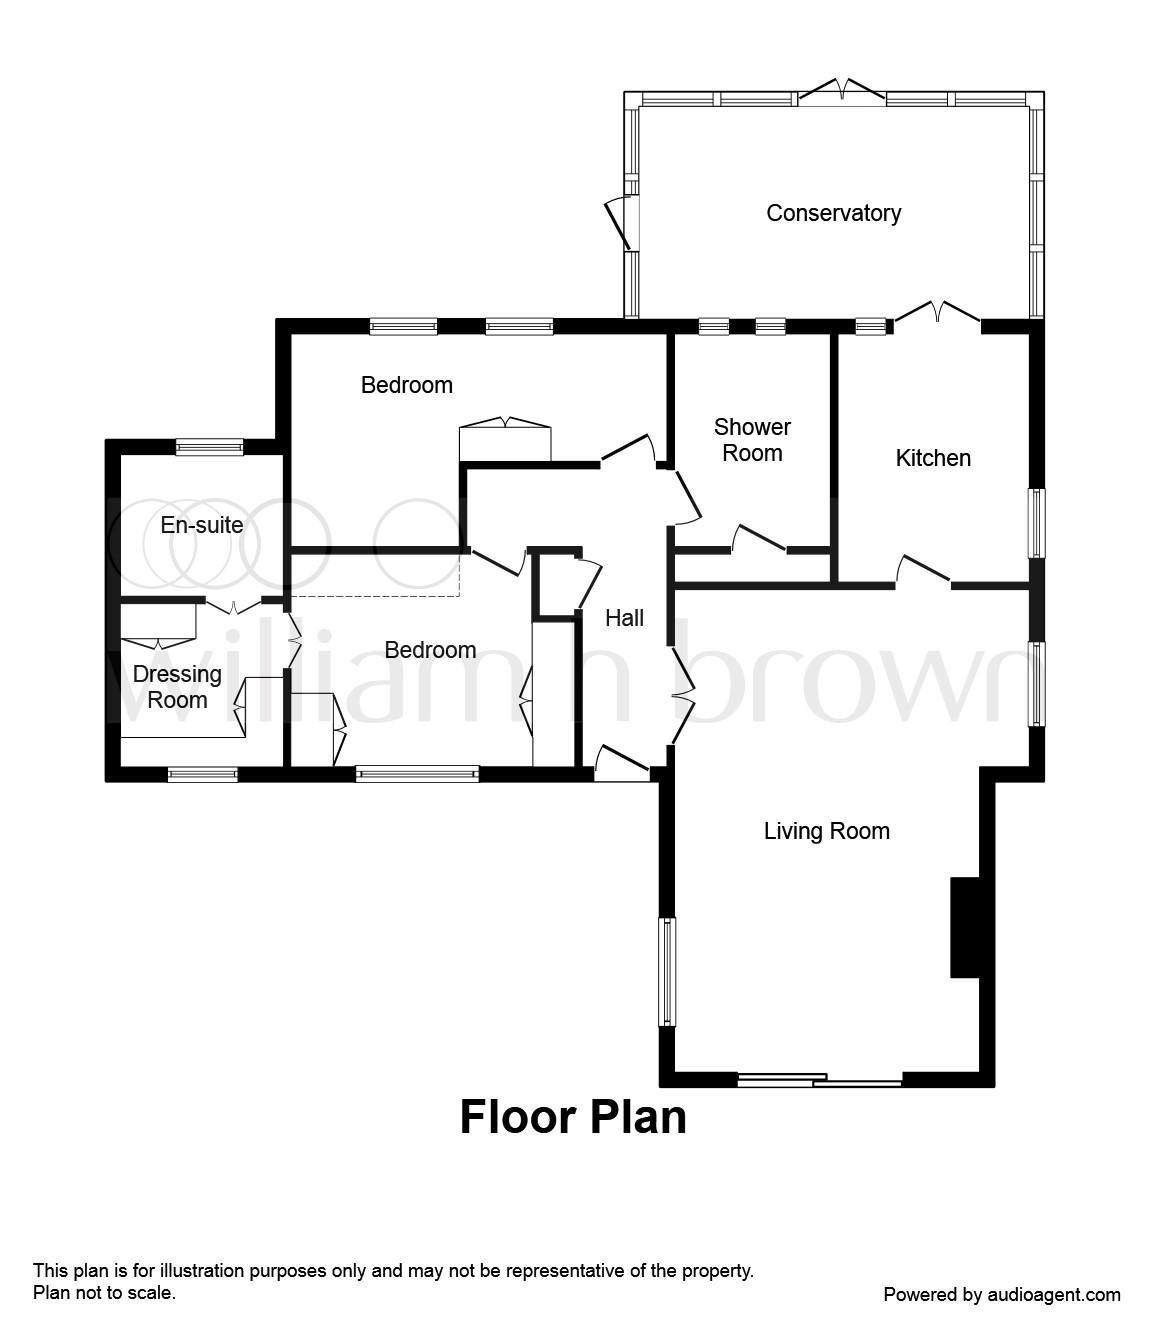 Wardour Drive, Grantham NG31, 2 bedroom detached bungalow